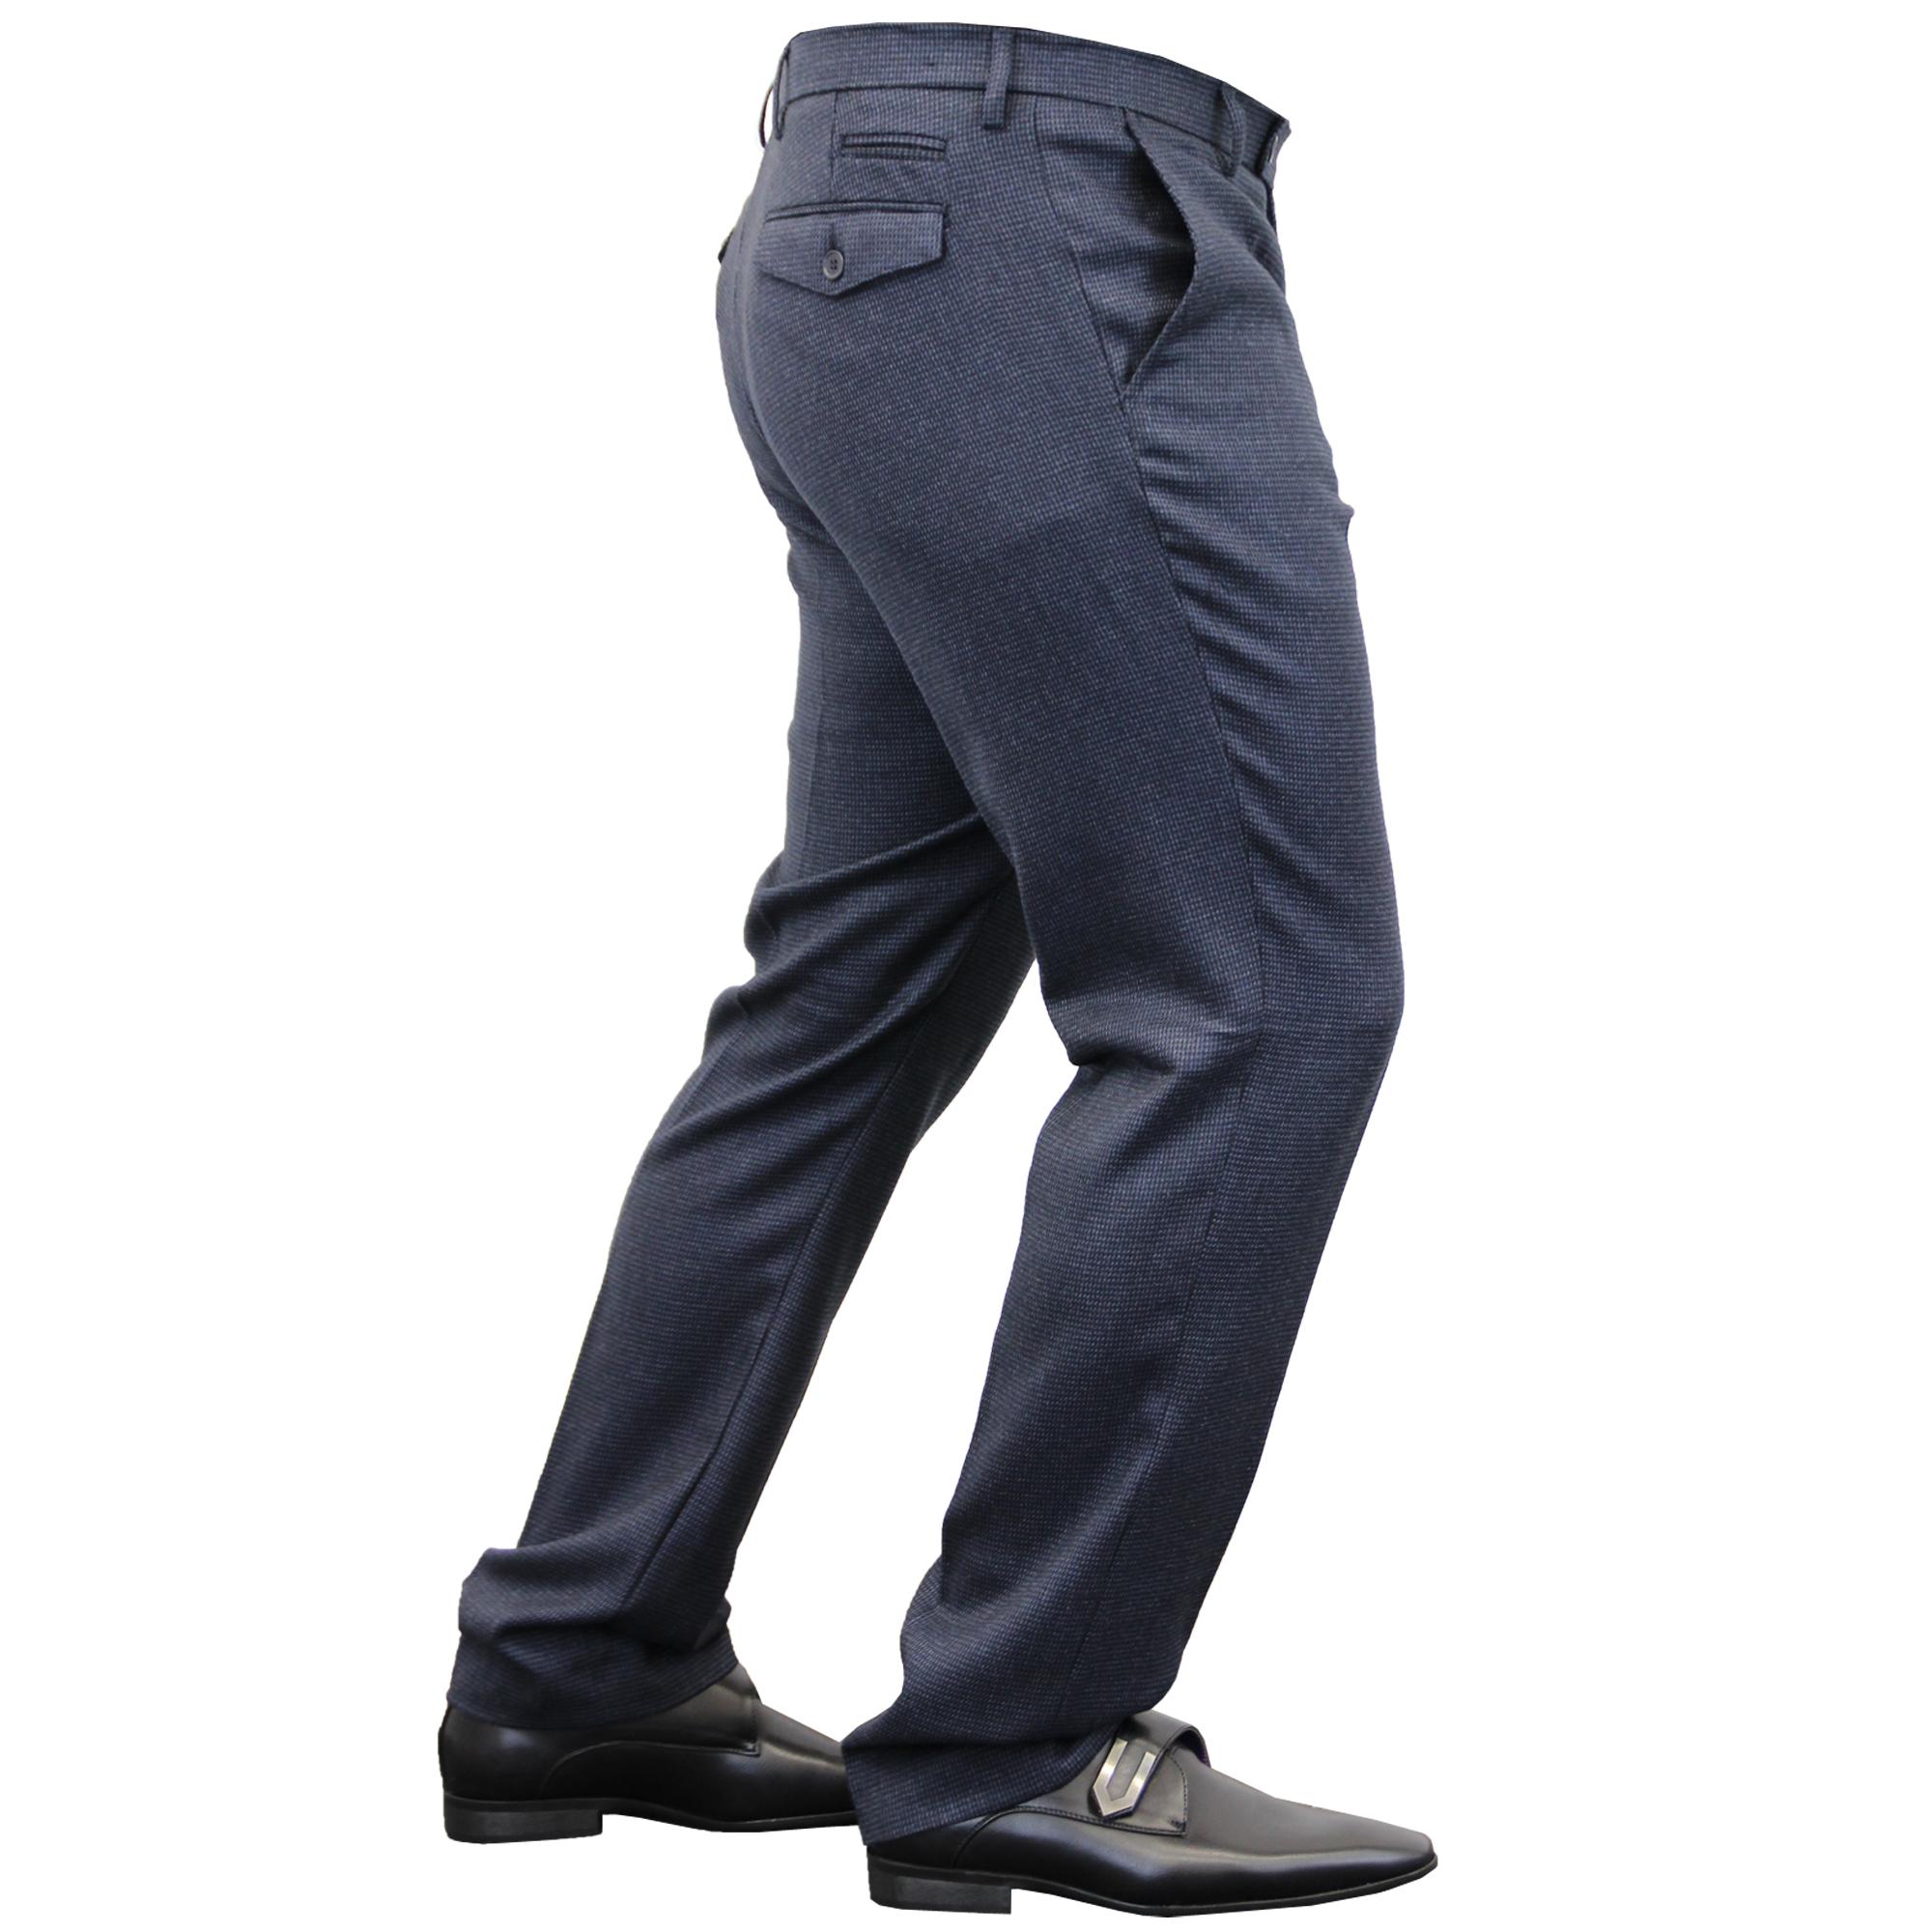 Mens-Trouser-Cavani-Pants-Formal-Wedding-Office-Work-Smart-Fashion-Casual-New thumbnail 3